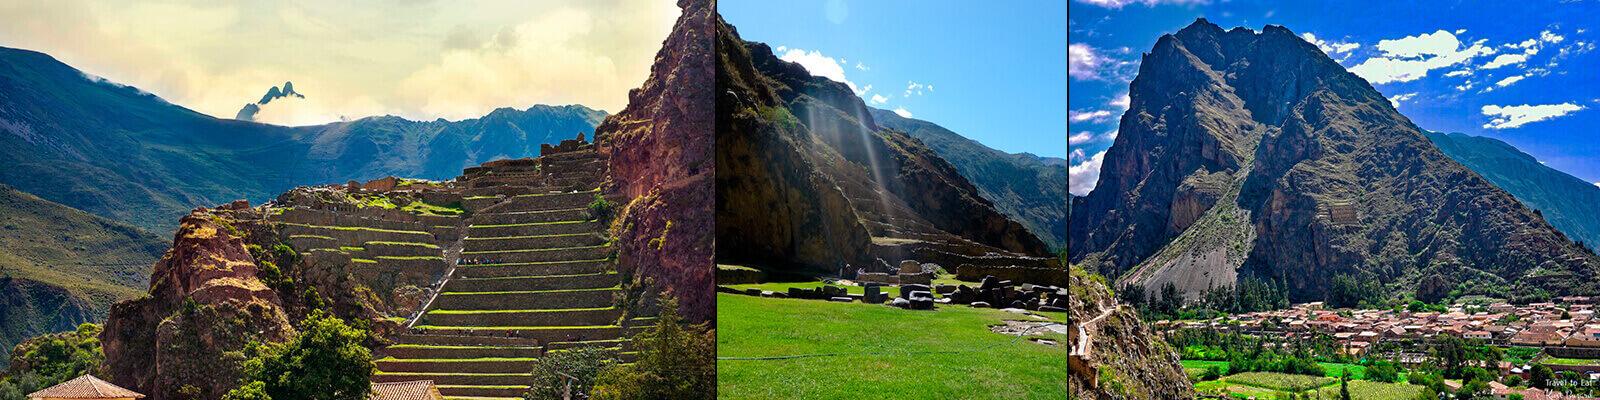 sacred-valley-ollantaytambo-machu-picchu-andes-tours